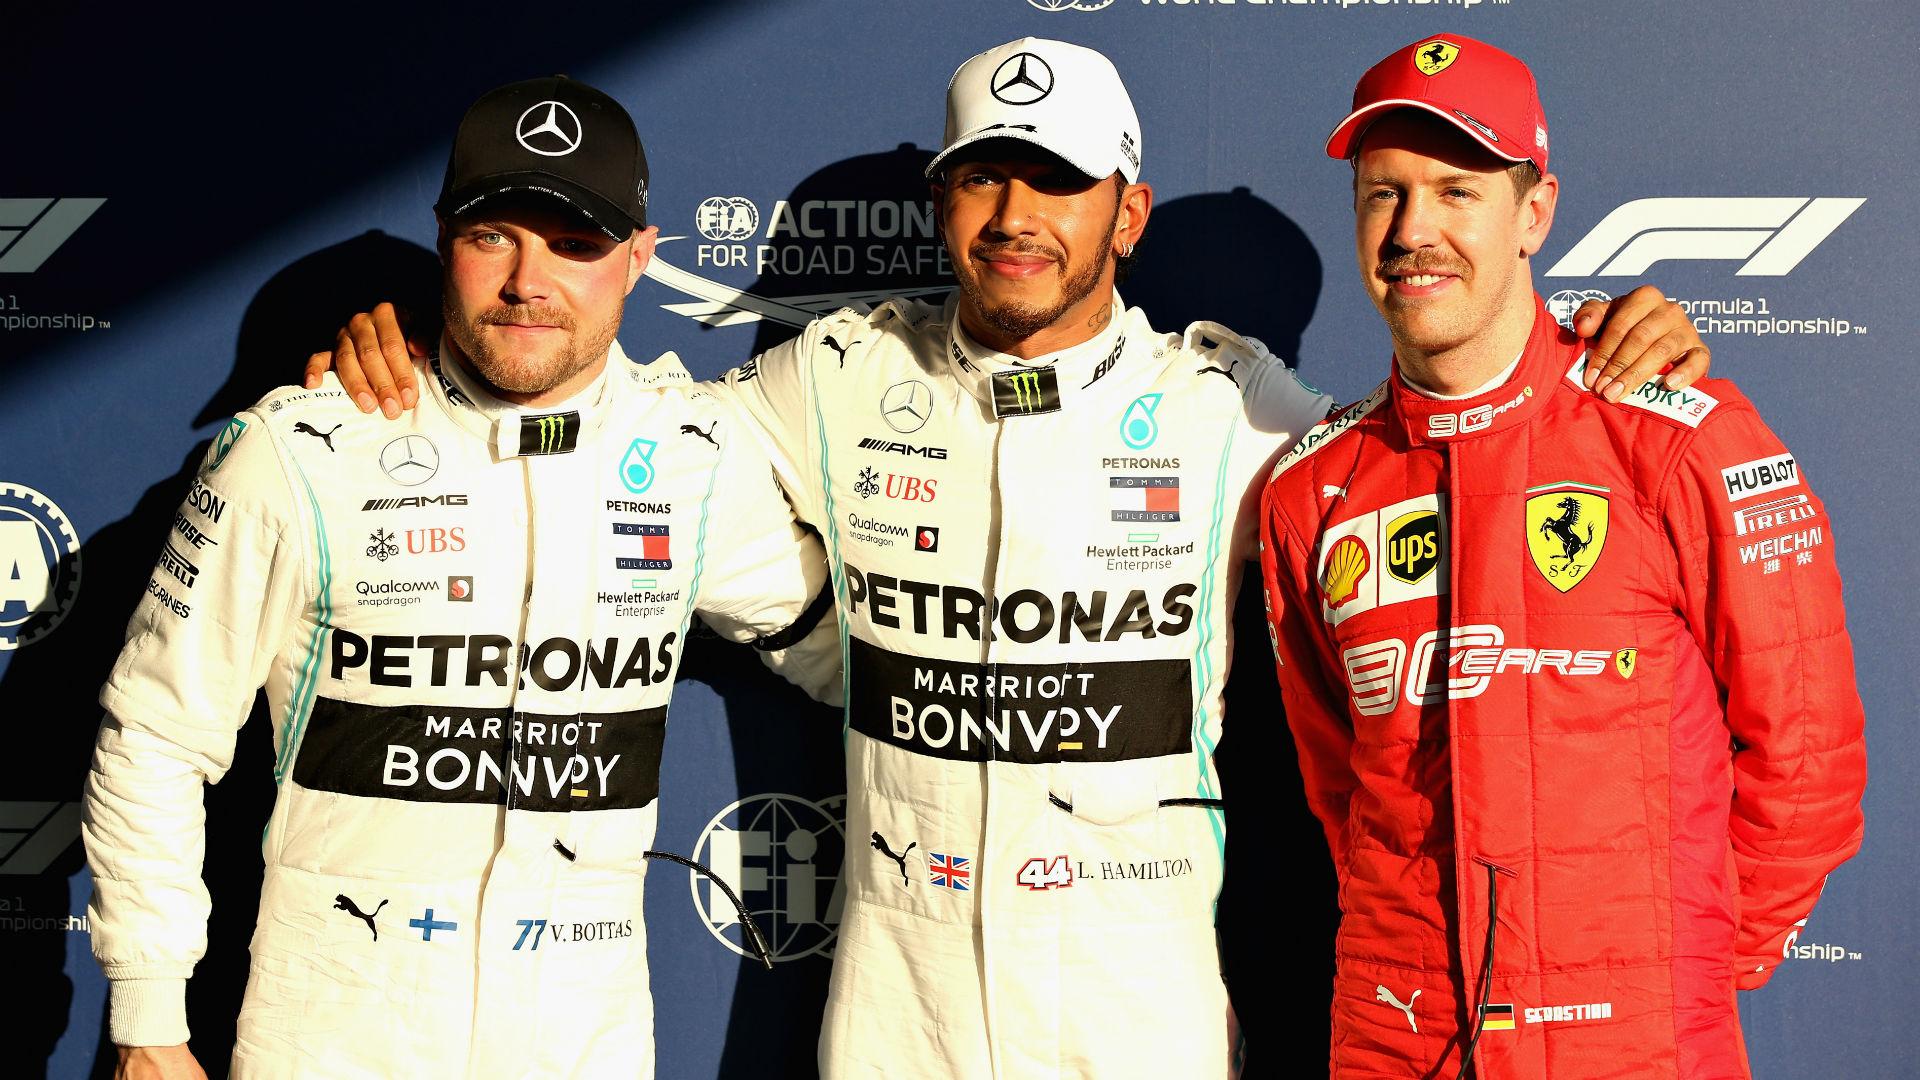 F1 Raceweek: Vettel hoping history repeats itself in Melbourne